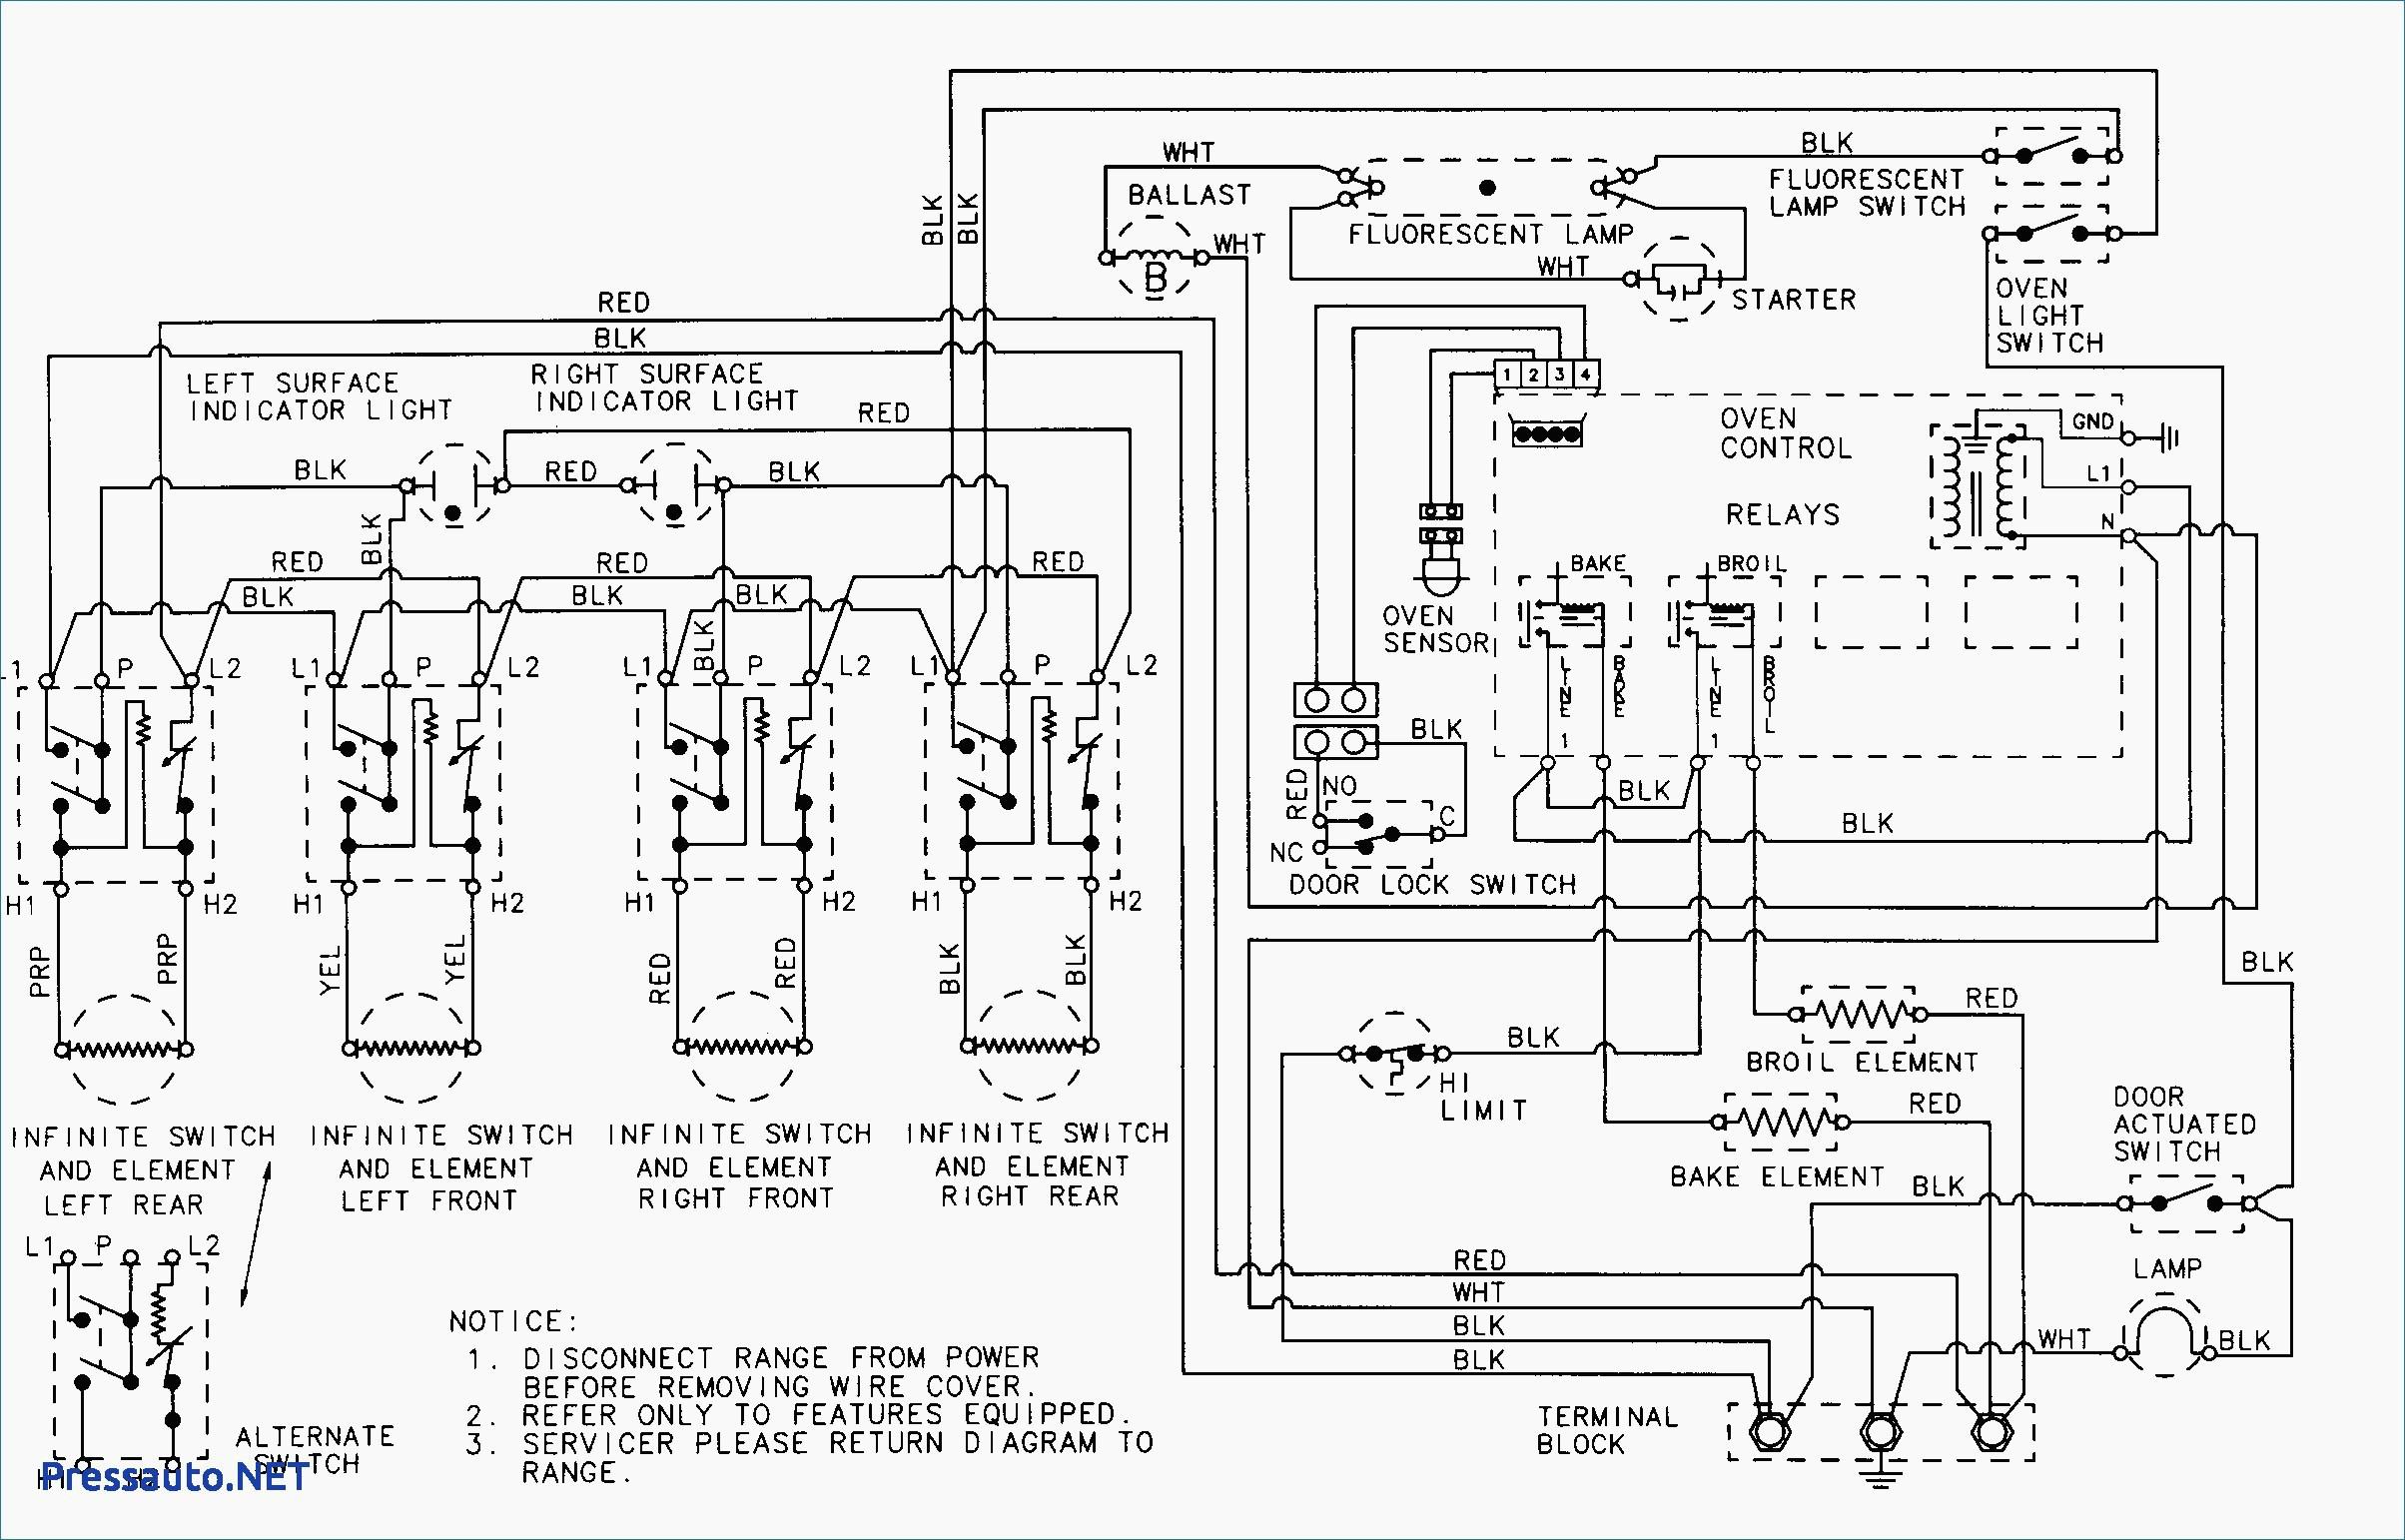 Wiring Diagram for Maytag Dryer Wiring Diagram for Ge Dryer Door Switch Free Downloads Wiring Of Wiring Diagram for Maytag Dryer